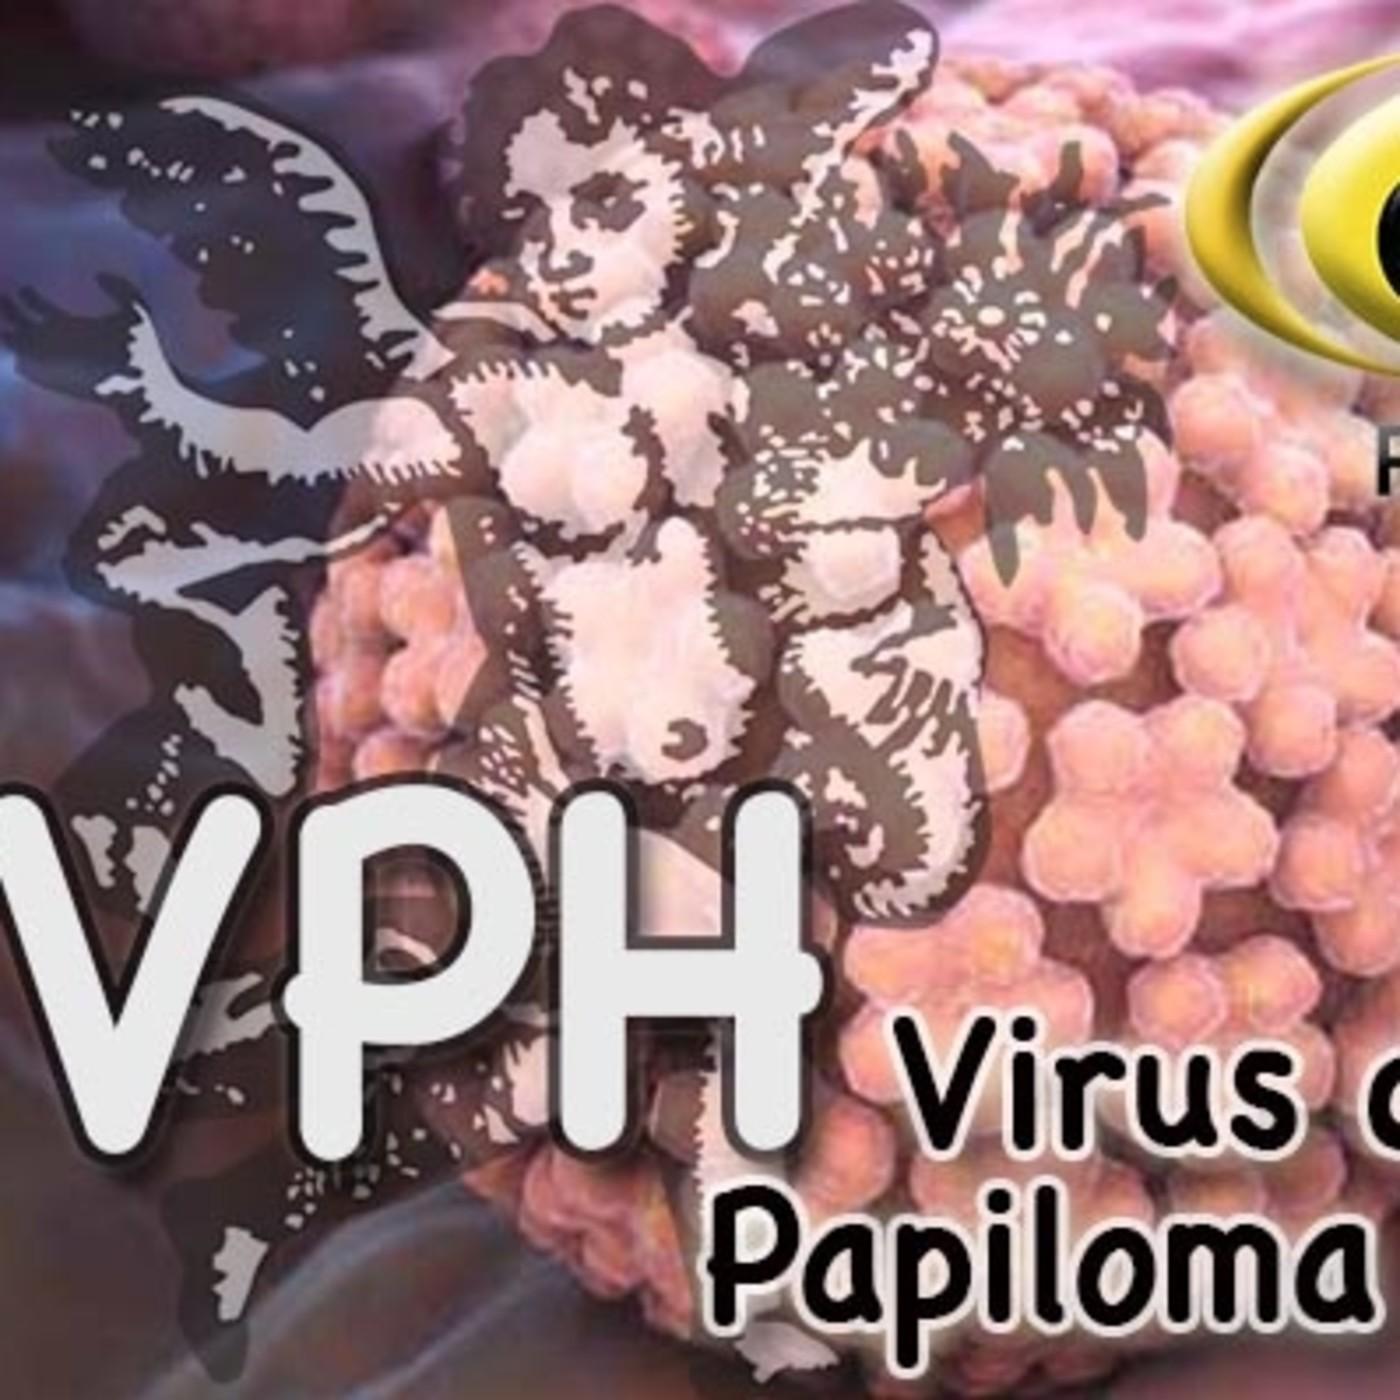 El Angel de tu Salud - VIRUS DE PAPILOMA HUMANO